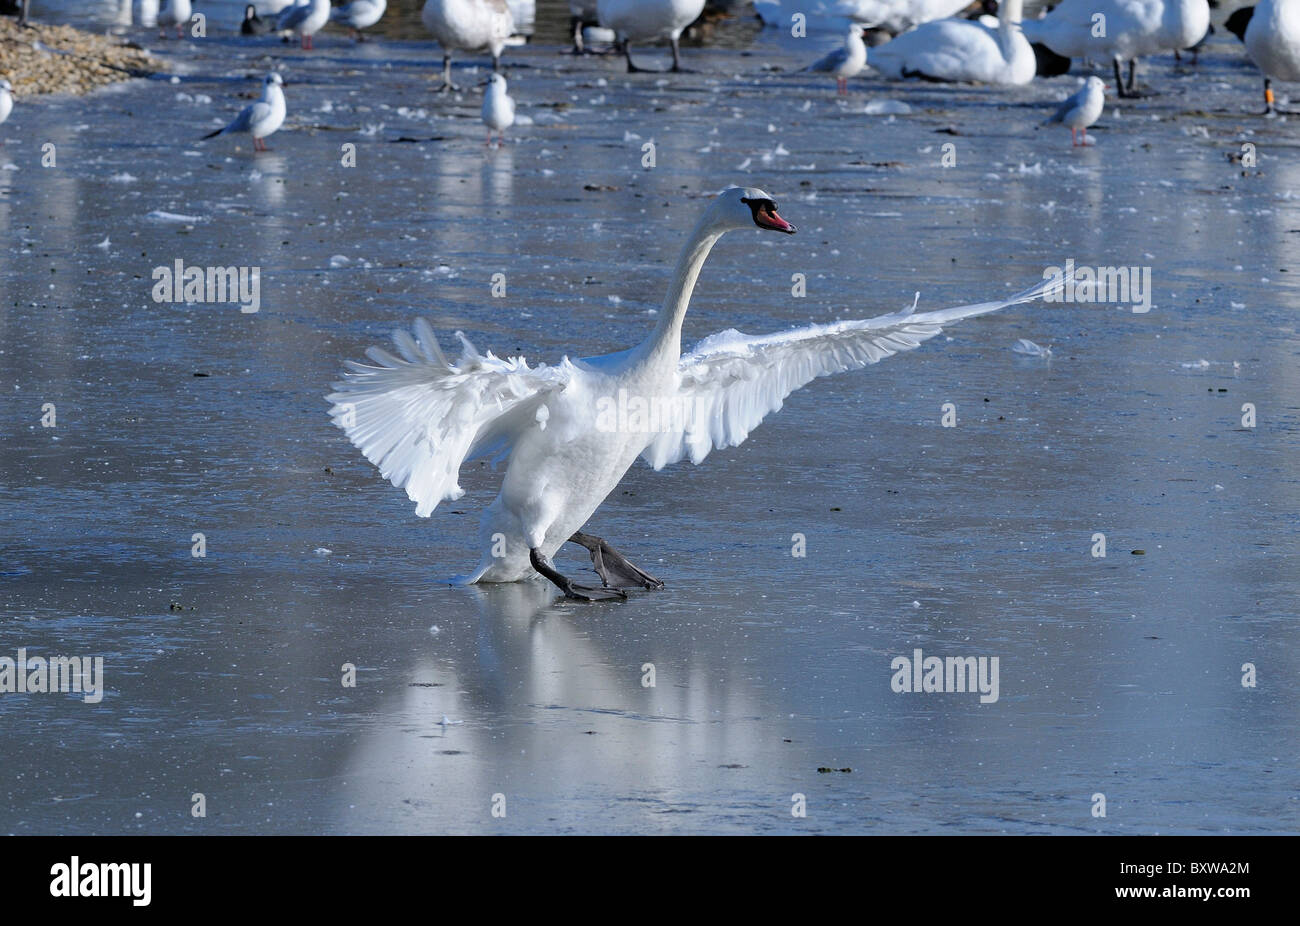 Mute Swan (Cygnus olor) walking on ice, wings outstretched, Slimbridge, UK. Stock Photo